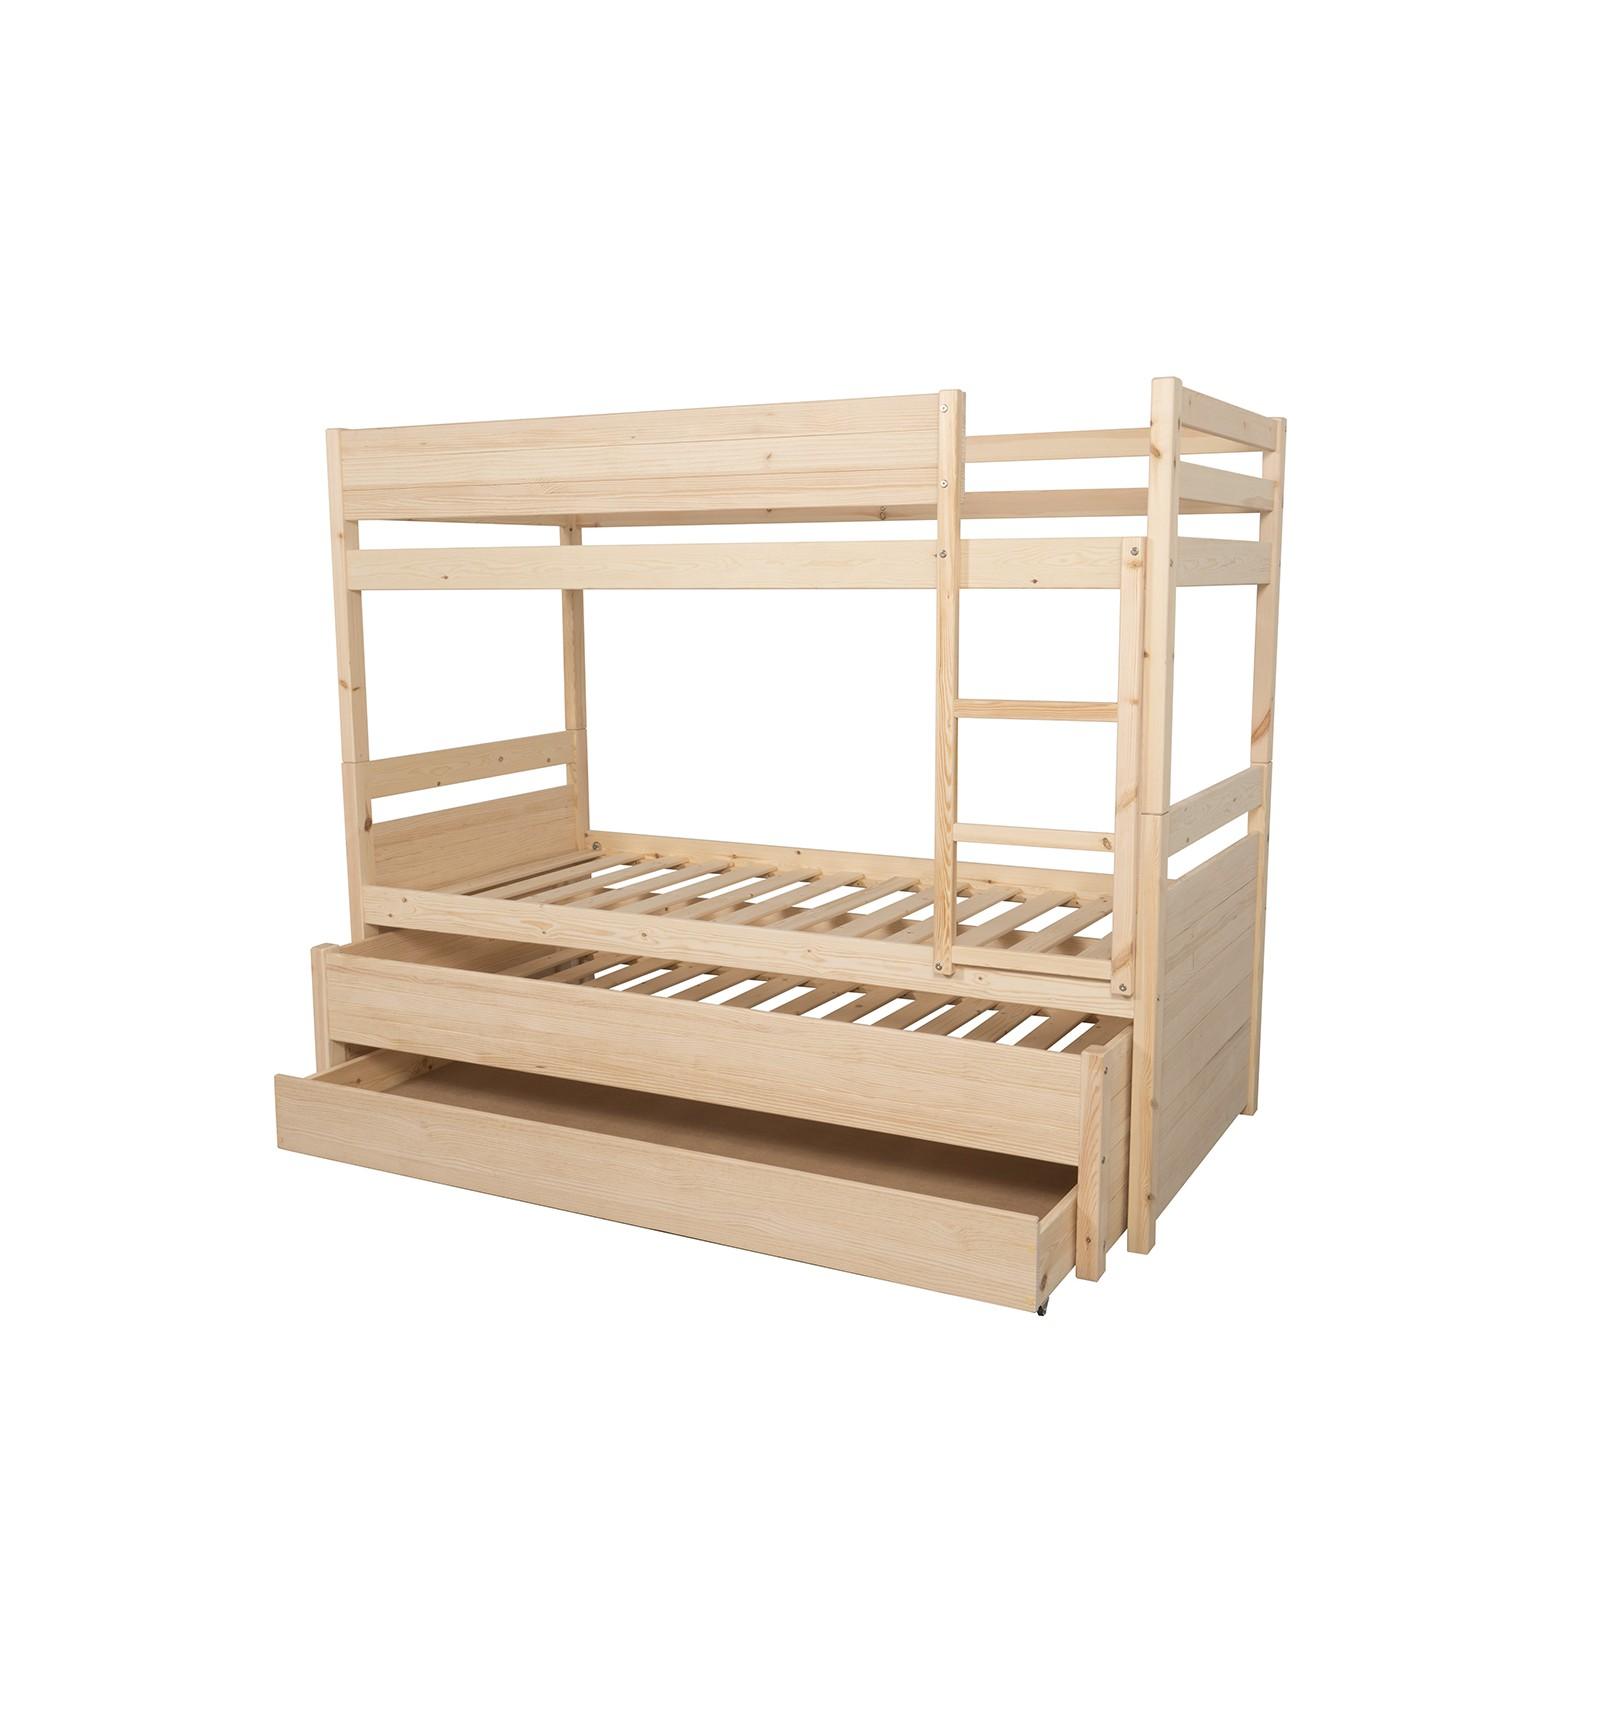 Comprar litera juvenil de madera tricompact for Literas juveniles economicas